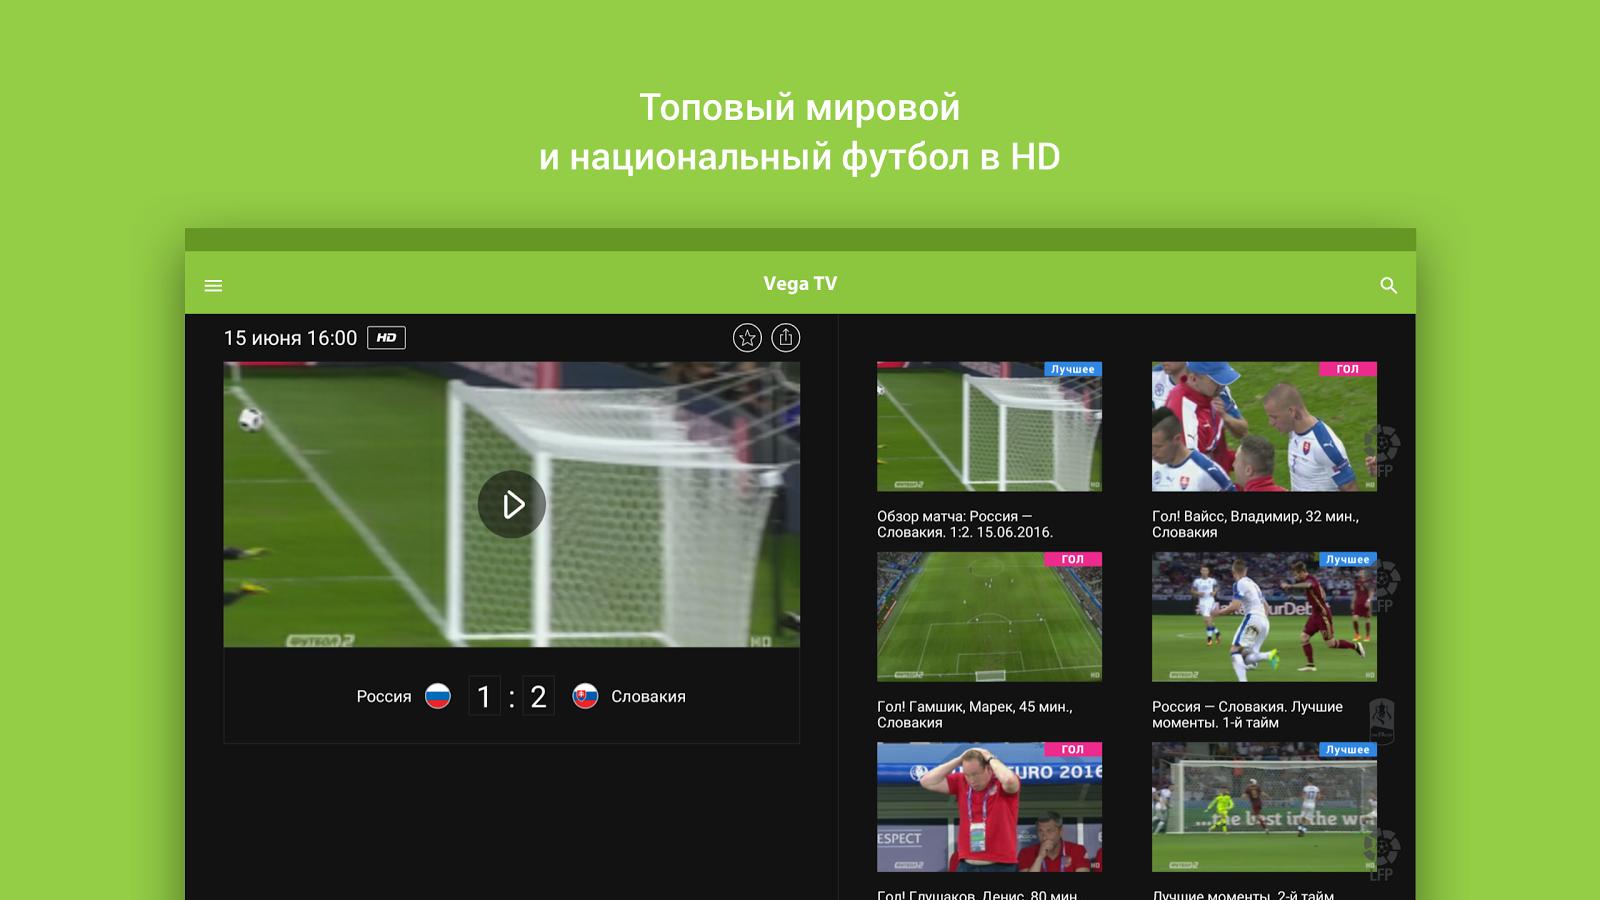 TV1 Megahit HD смотреть онлайн бесплатно - OneLike TV